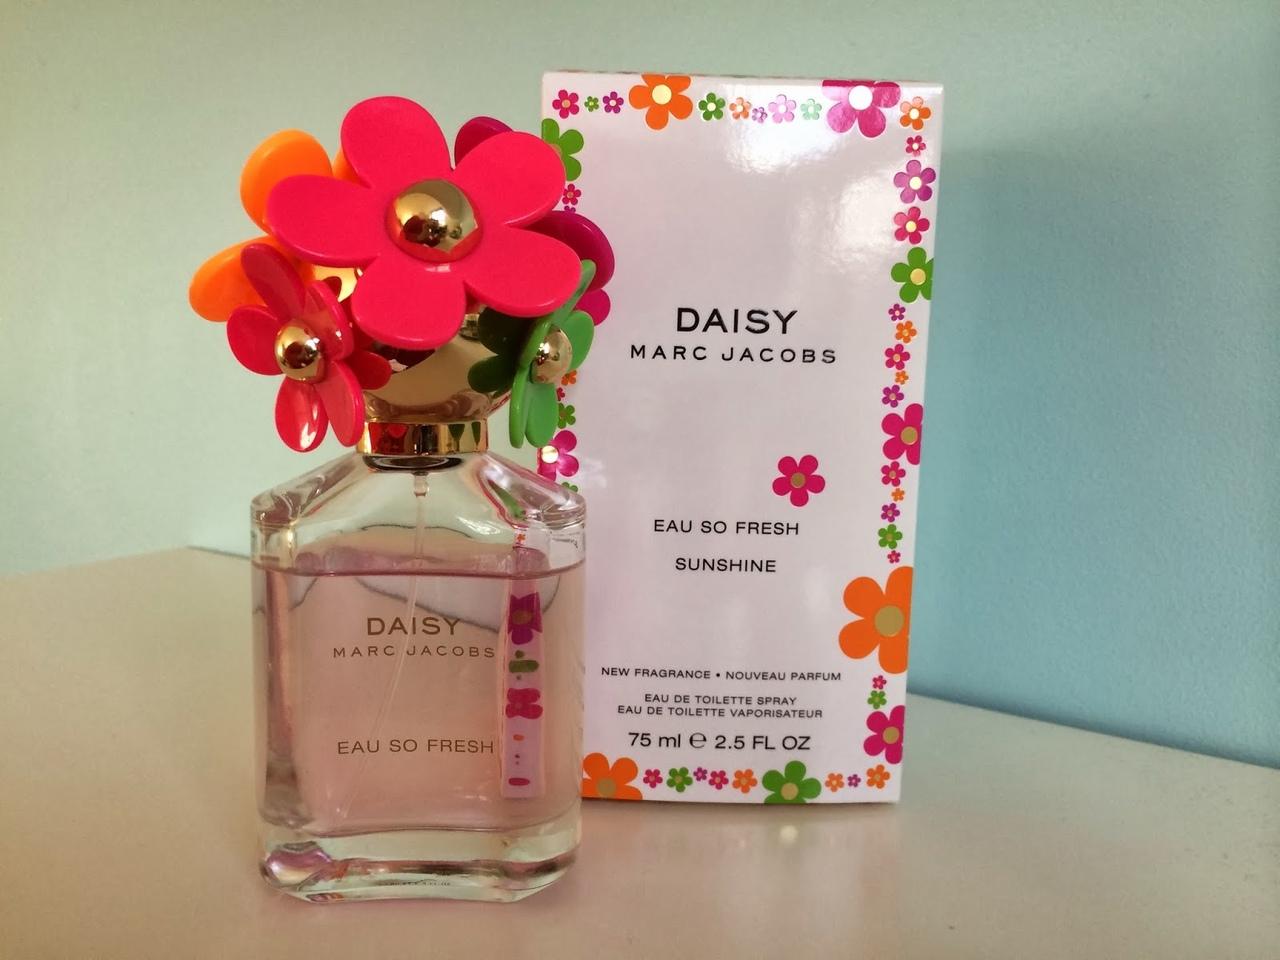 Marc Jacobs Daisy Eau So Fresh Sunshine 100 ml. 1650 рублей.